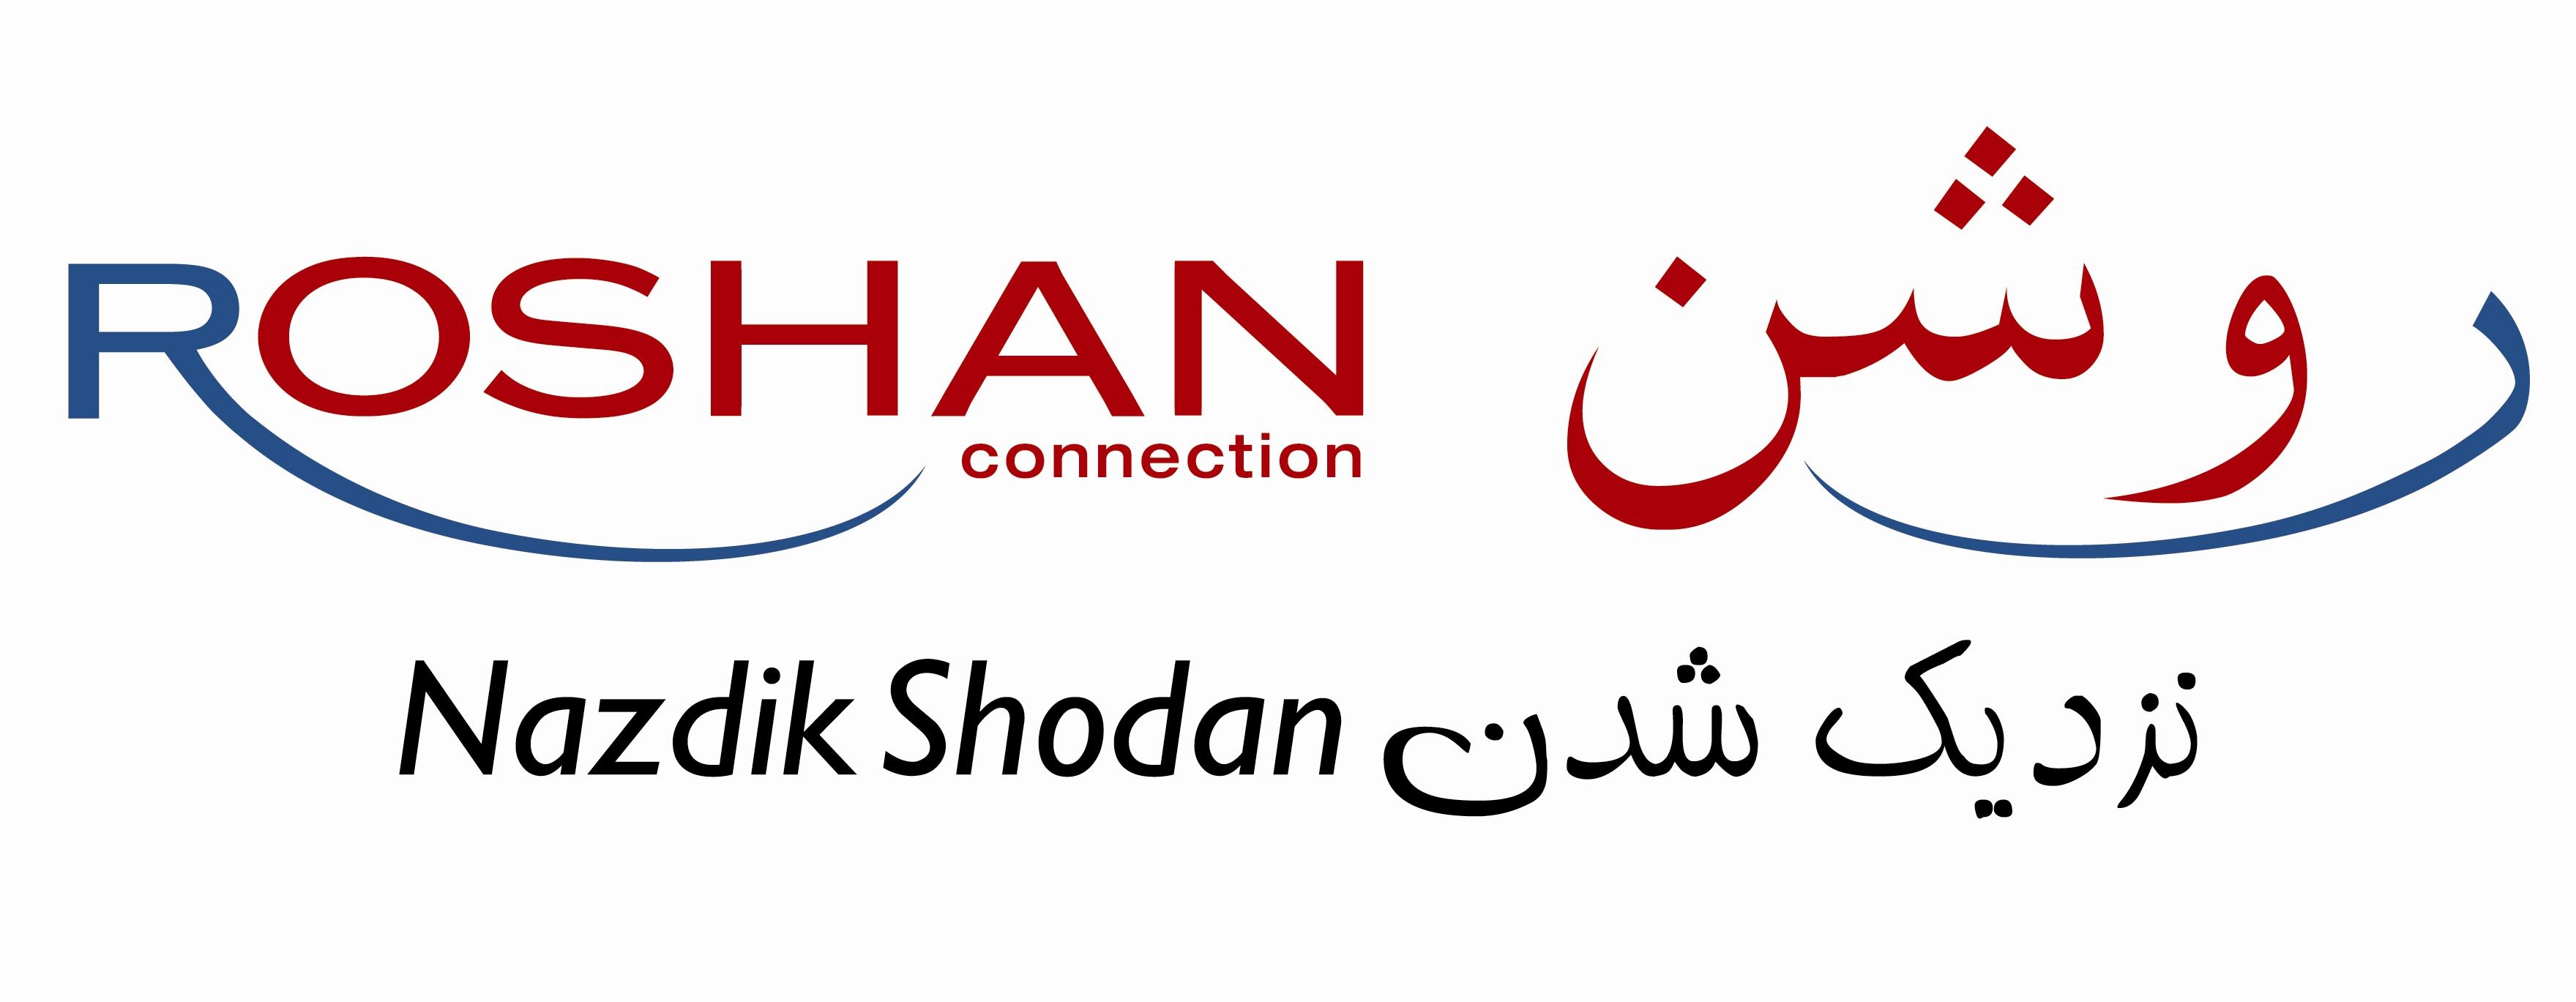 Refill Afghanistan Roshan- @mrsimcard